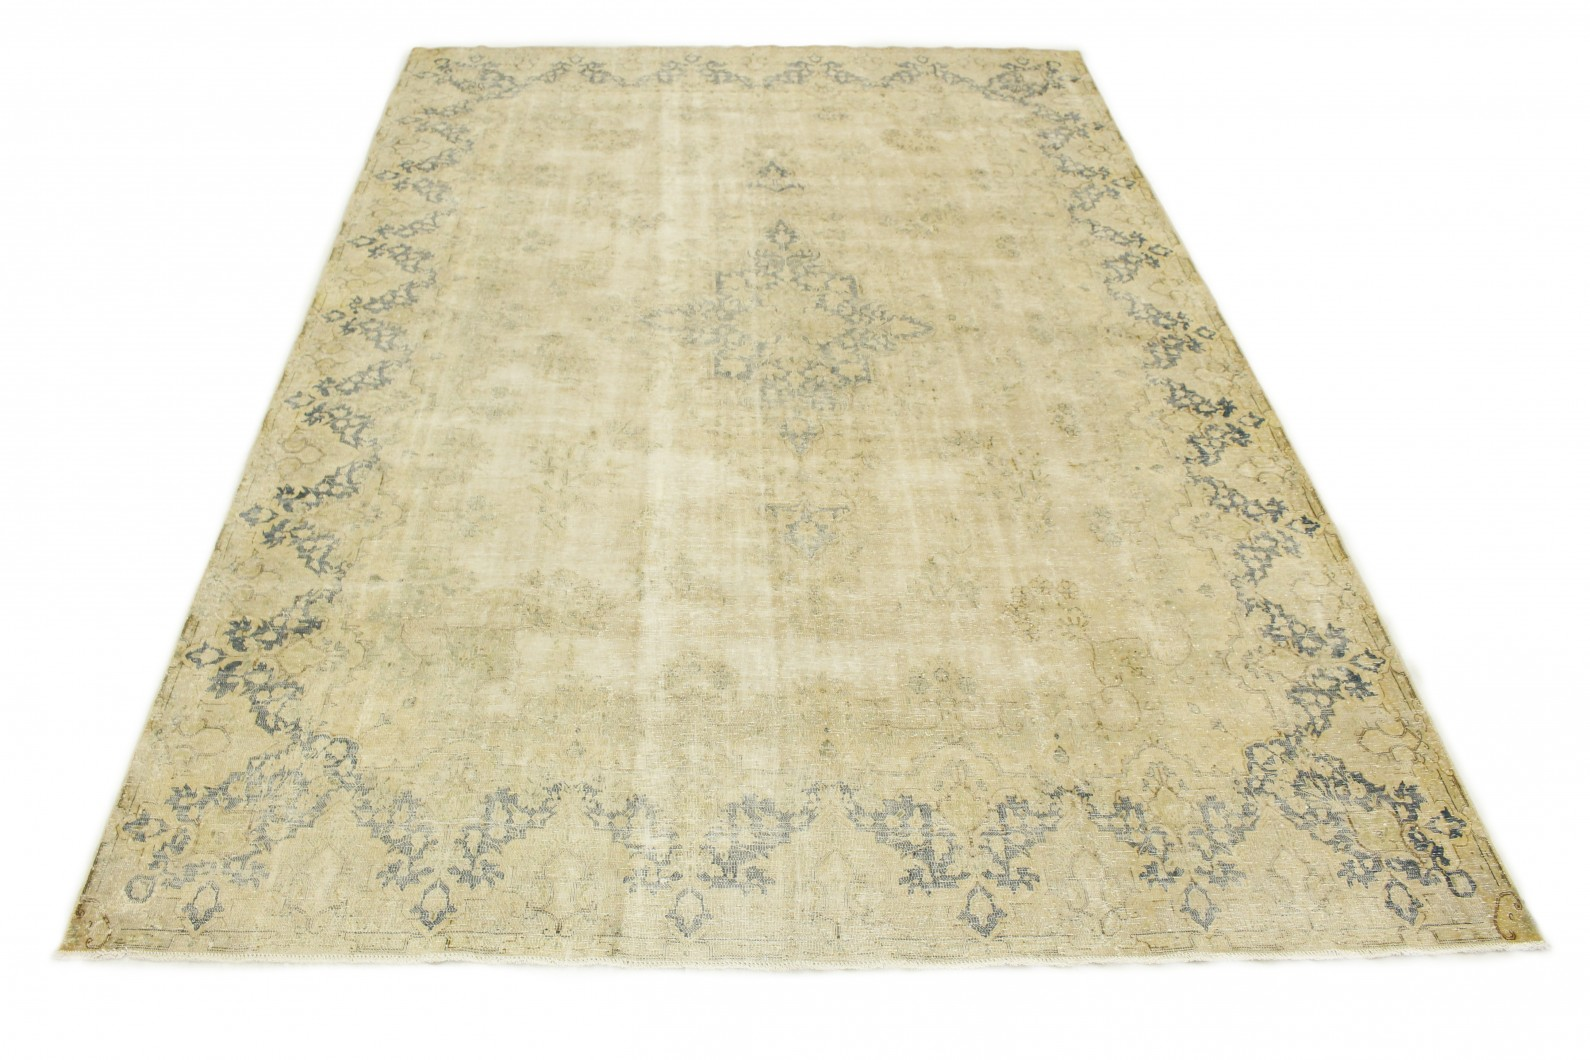 vintage teppich beige blau in 430x300 1001 3858. Black Bedroom Furniture Sets. Home Design Ideas